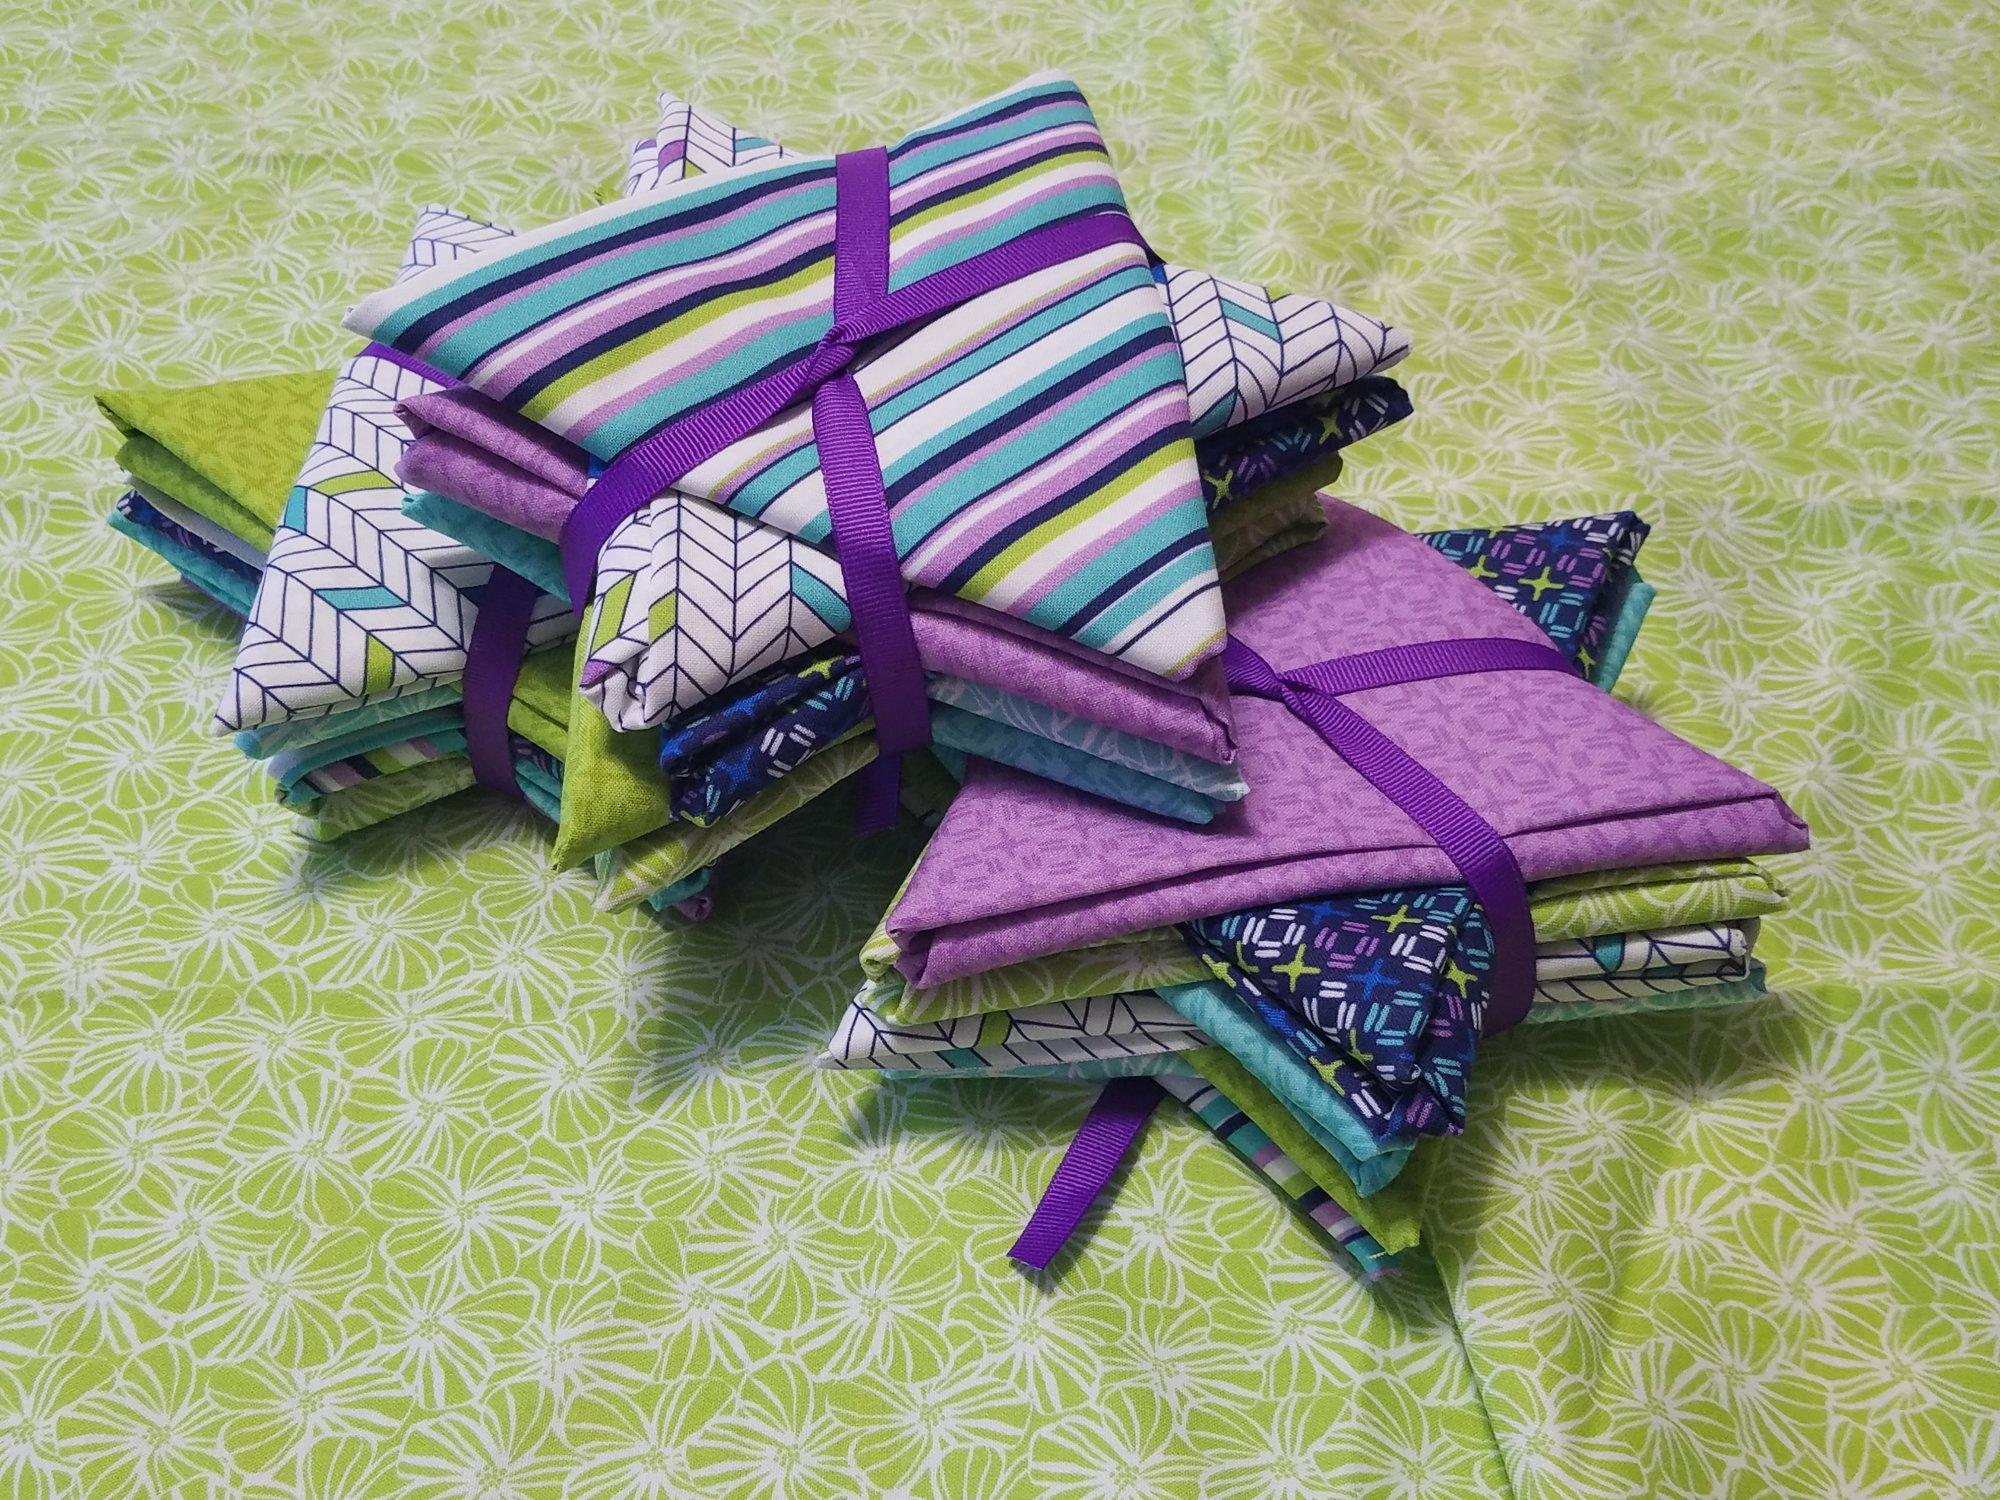 Lexi Star 8 FQ  aqua/green & purple/navy